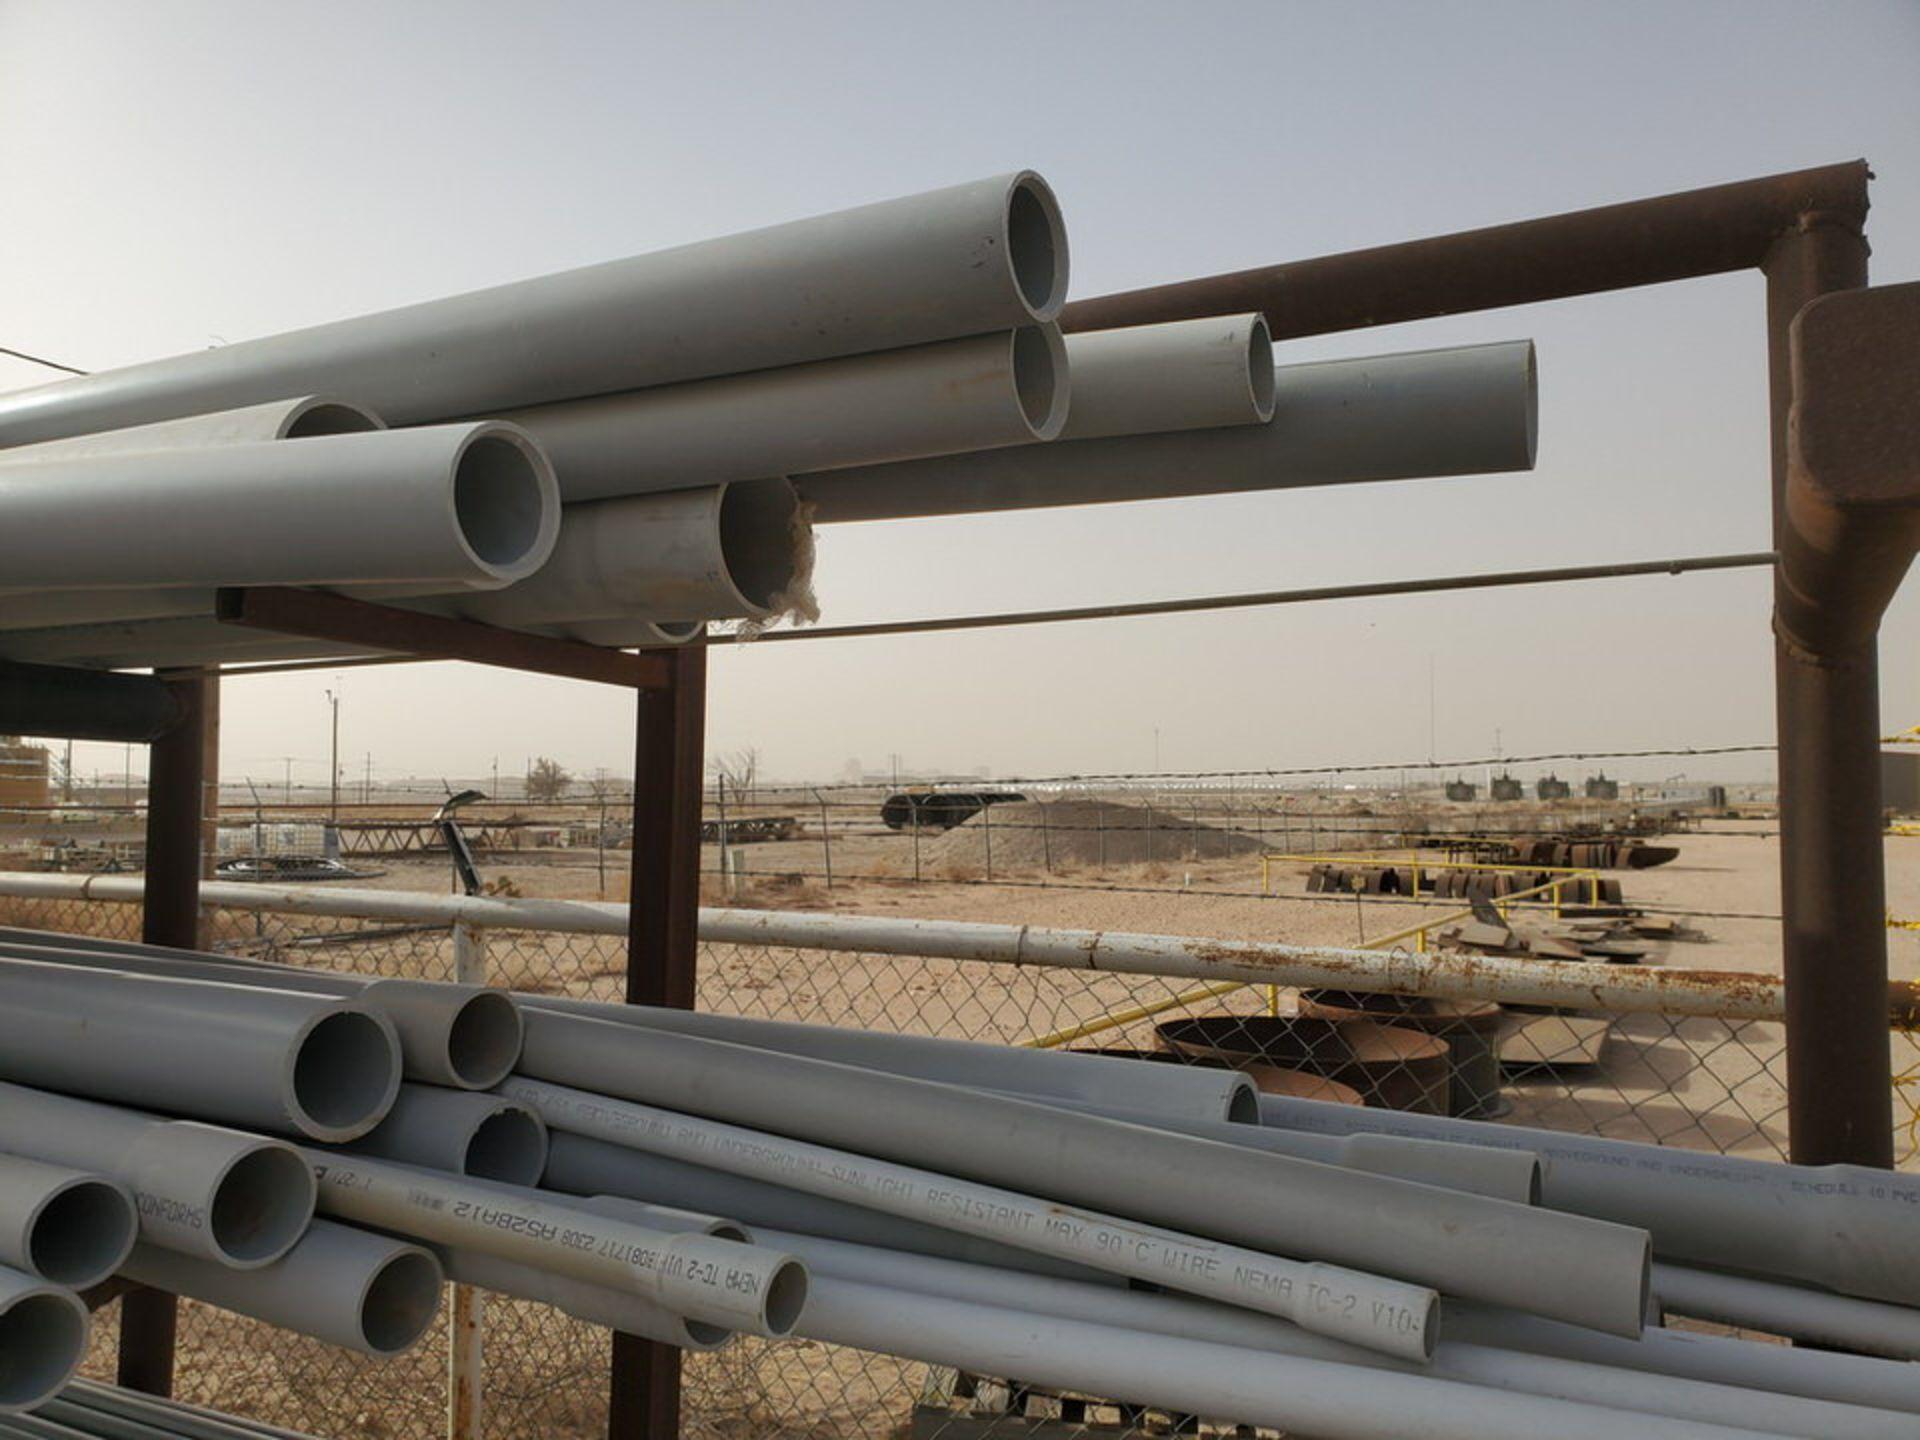 "PVC & Alum. Pipe W/ Conduit Size Range: 1/2"" - 4"" W/ Rack - Image 7 of 18"